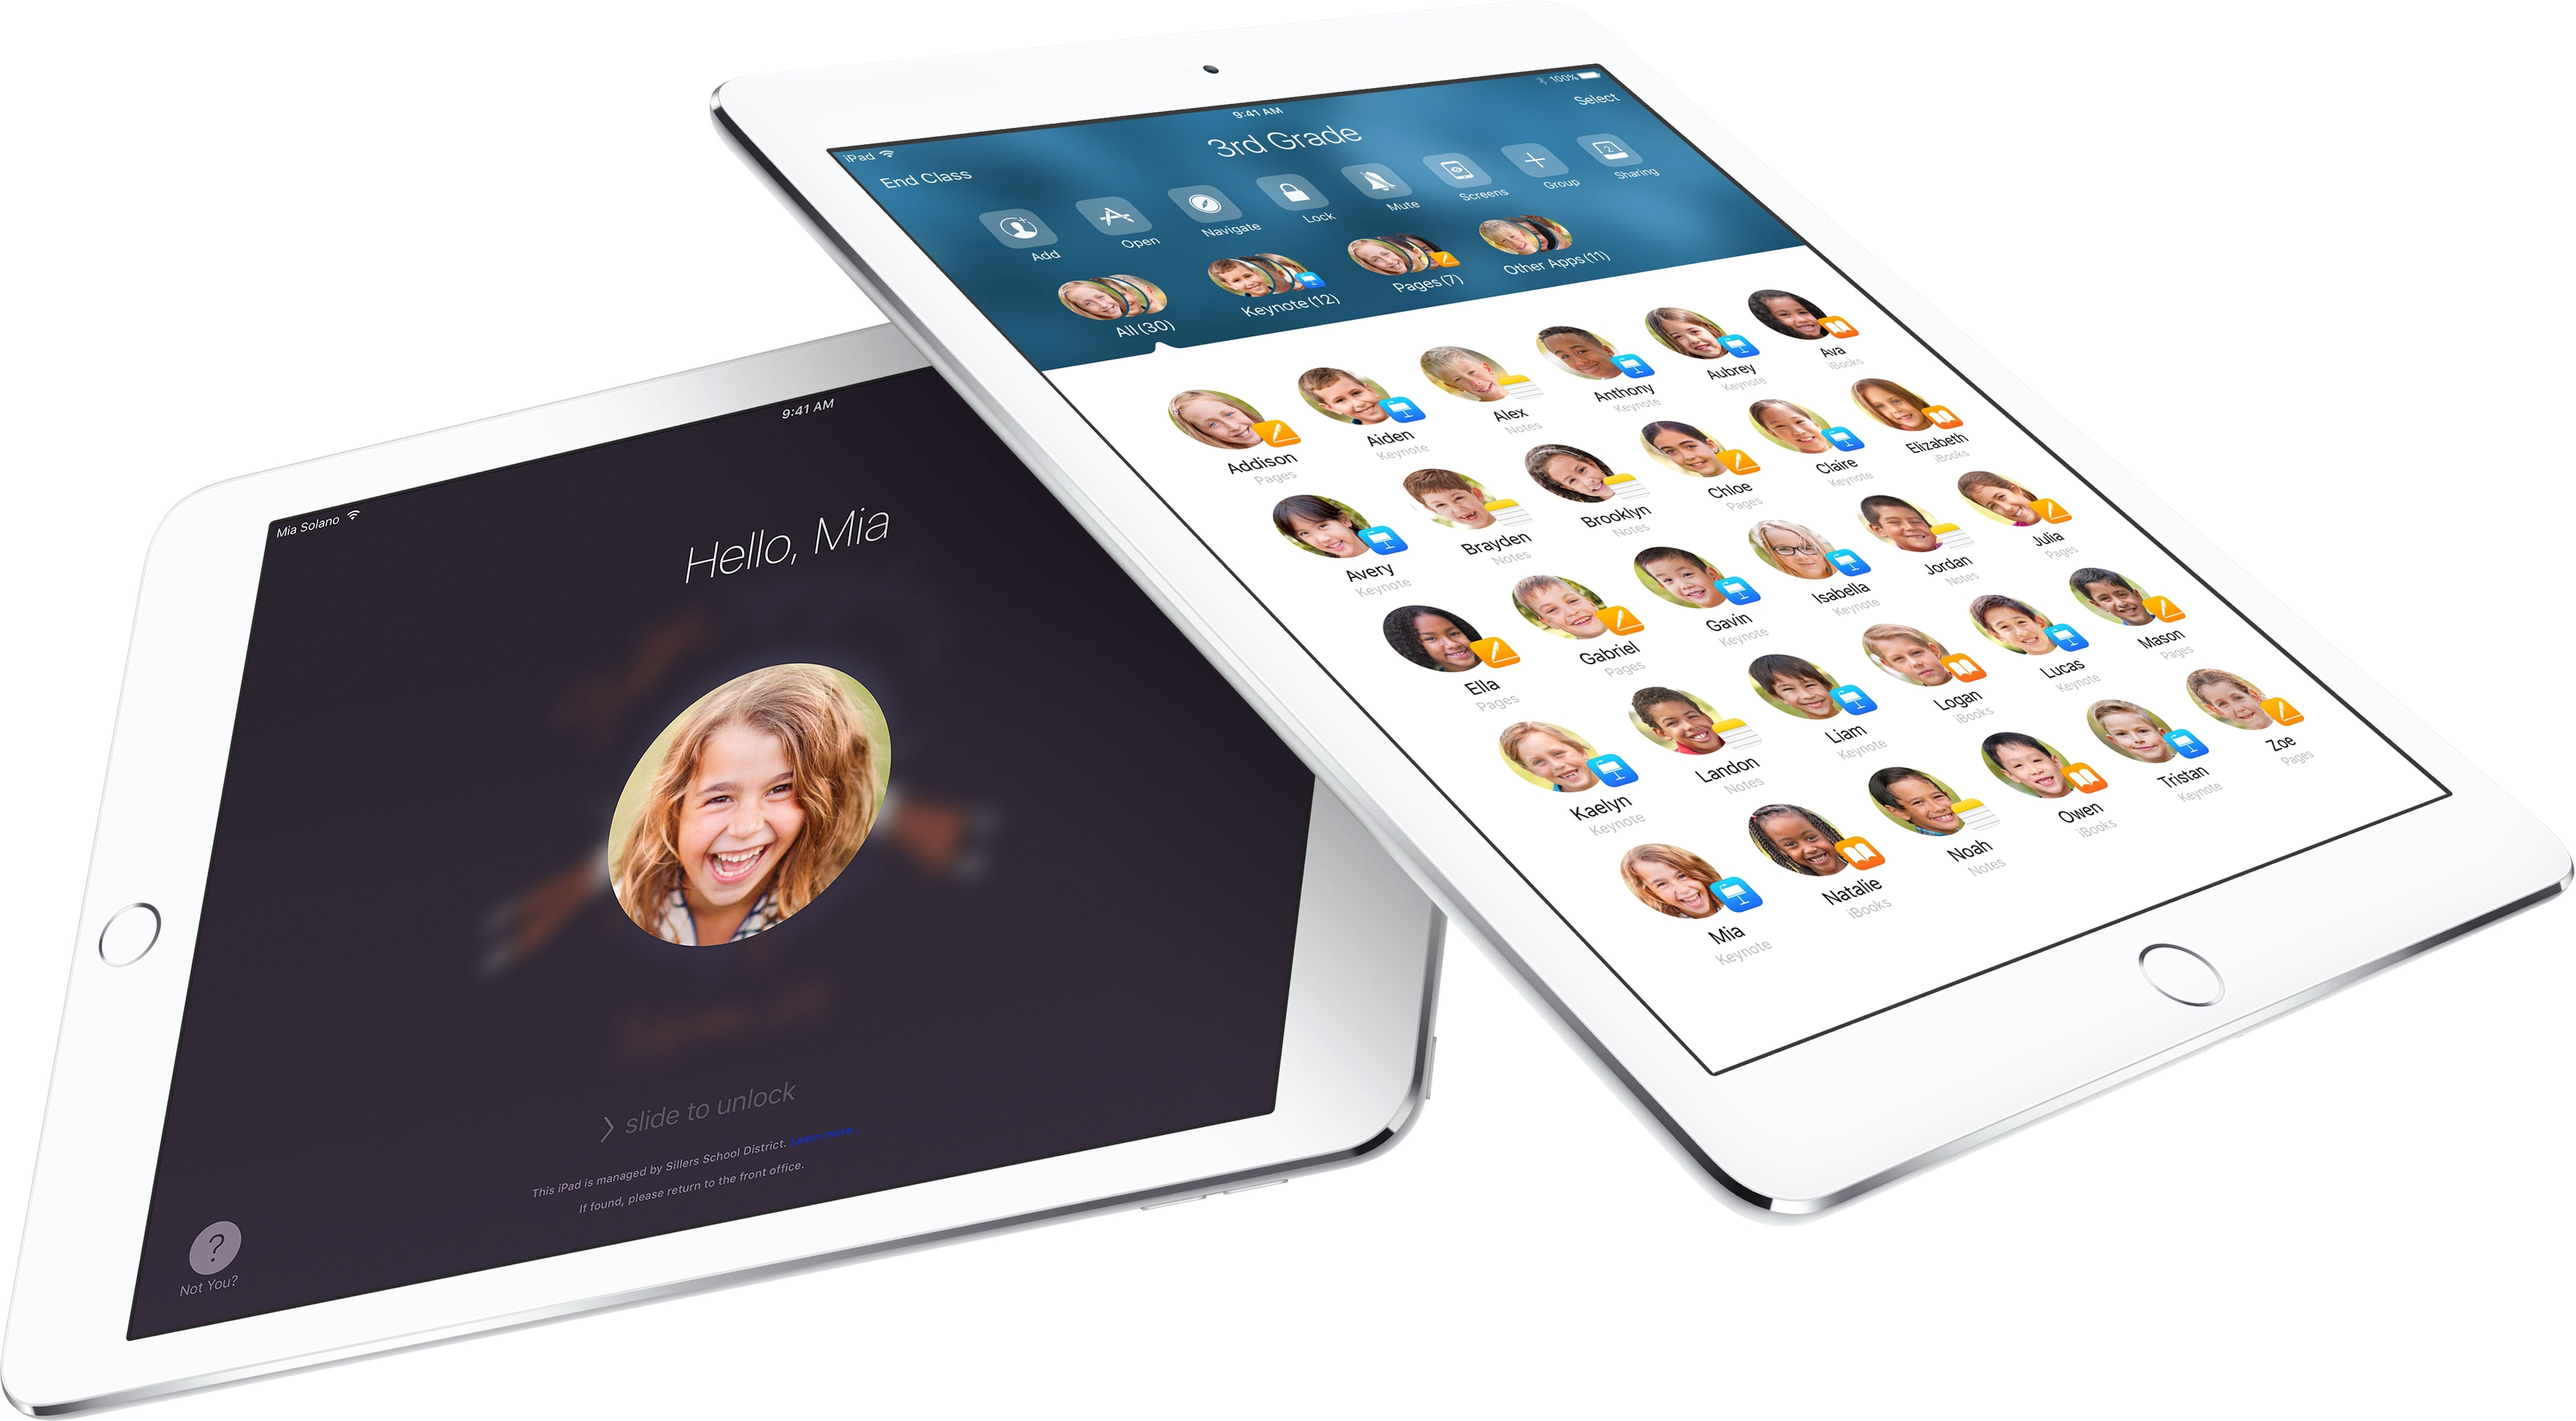 App Sala de Aula (Classroom) em iPads